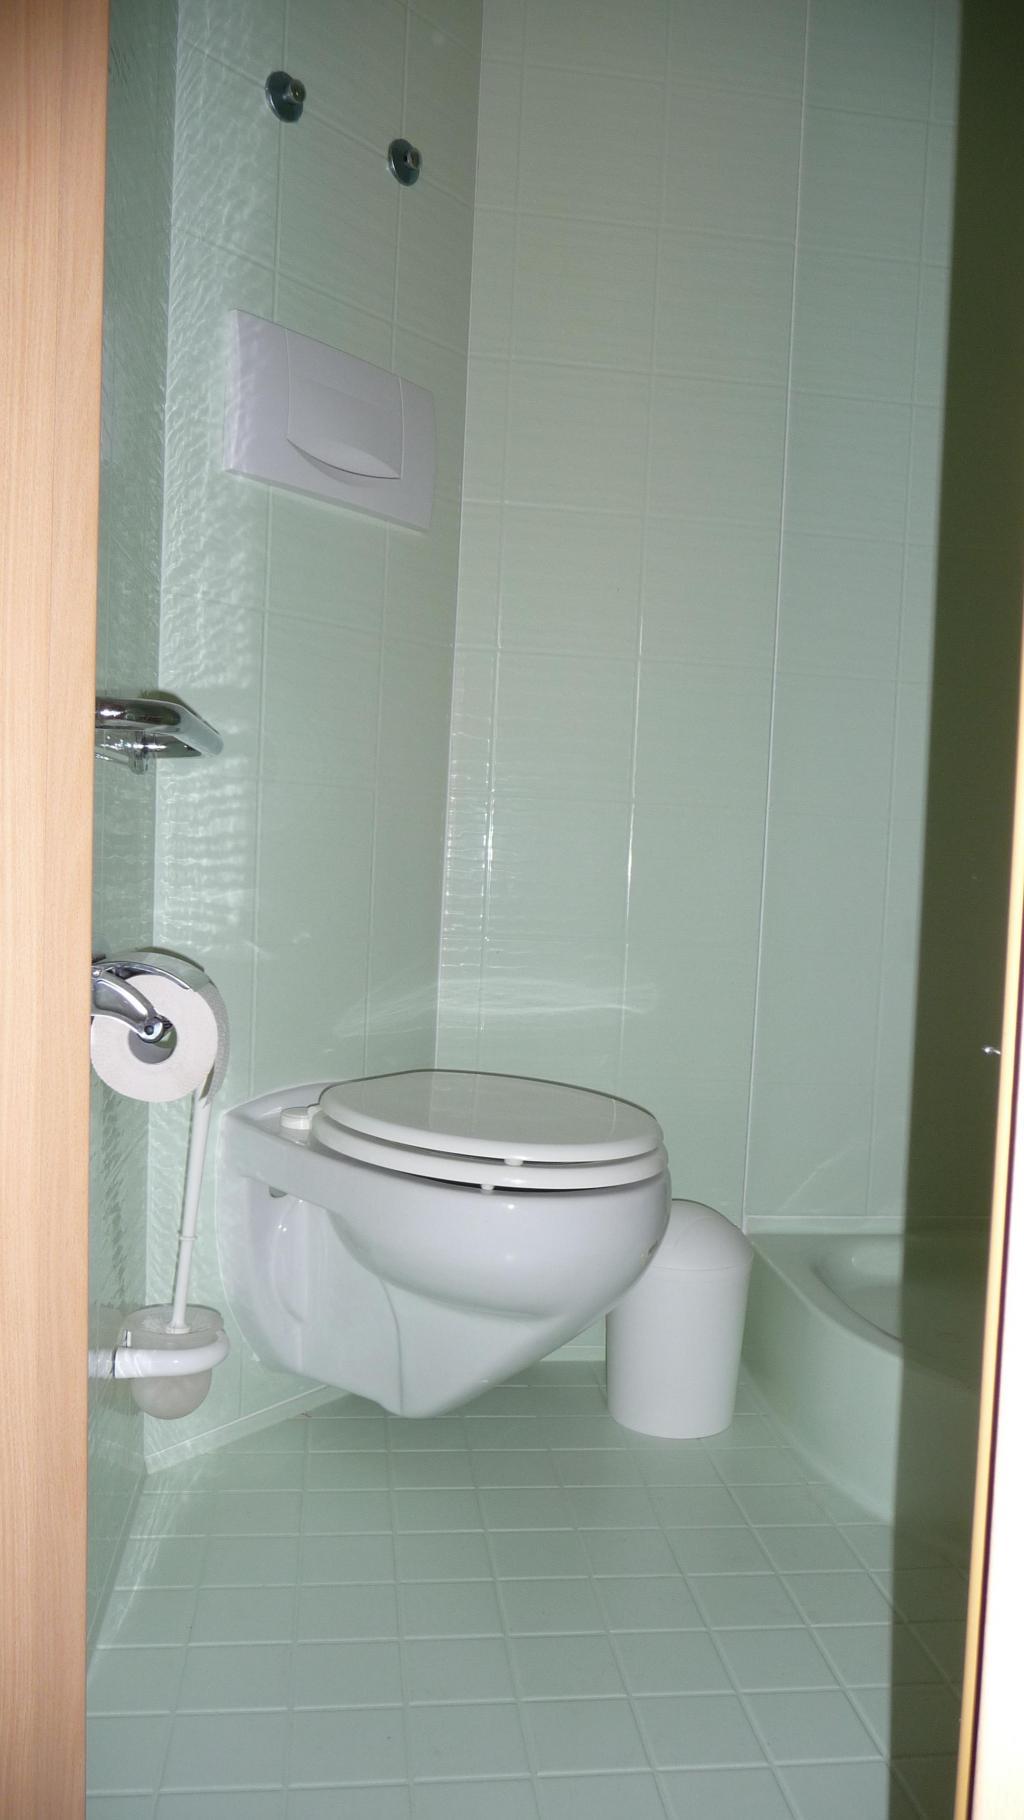 fertigbad nasszelle mit waschbecken dusche wc - Nasszelle Dusche Wc